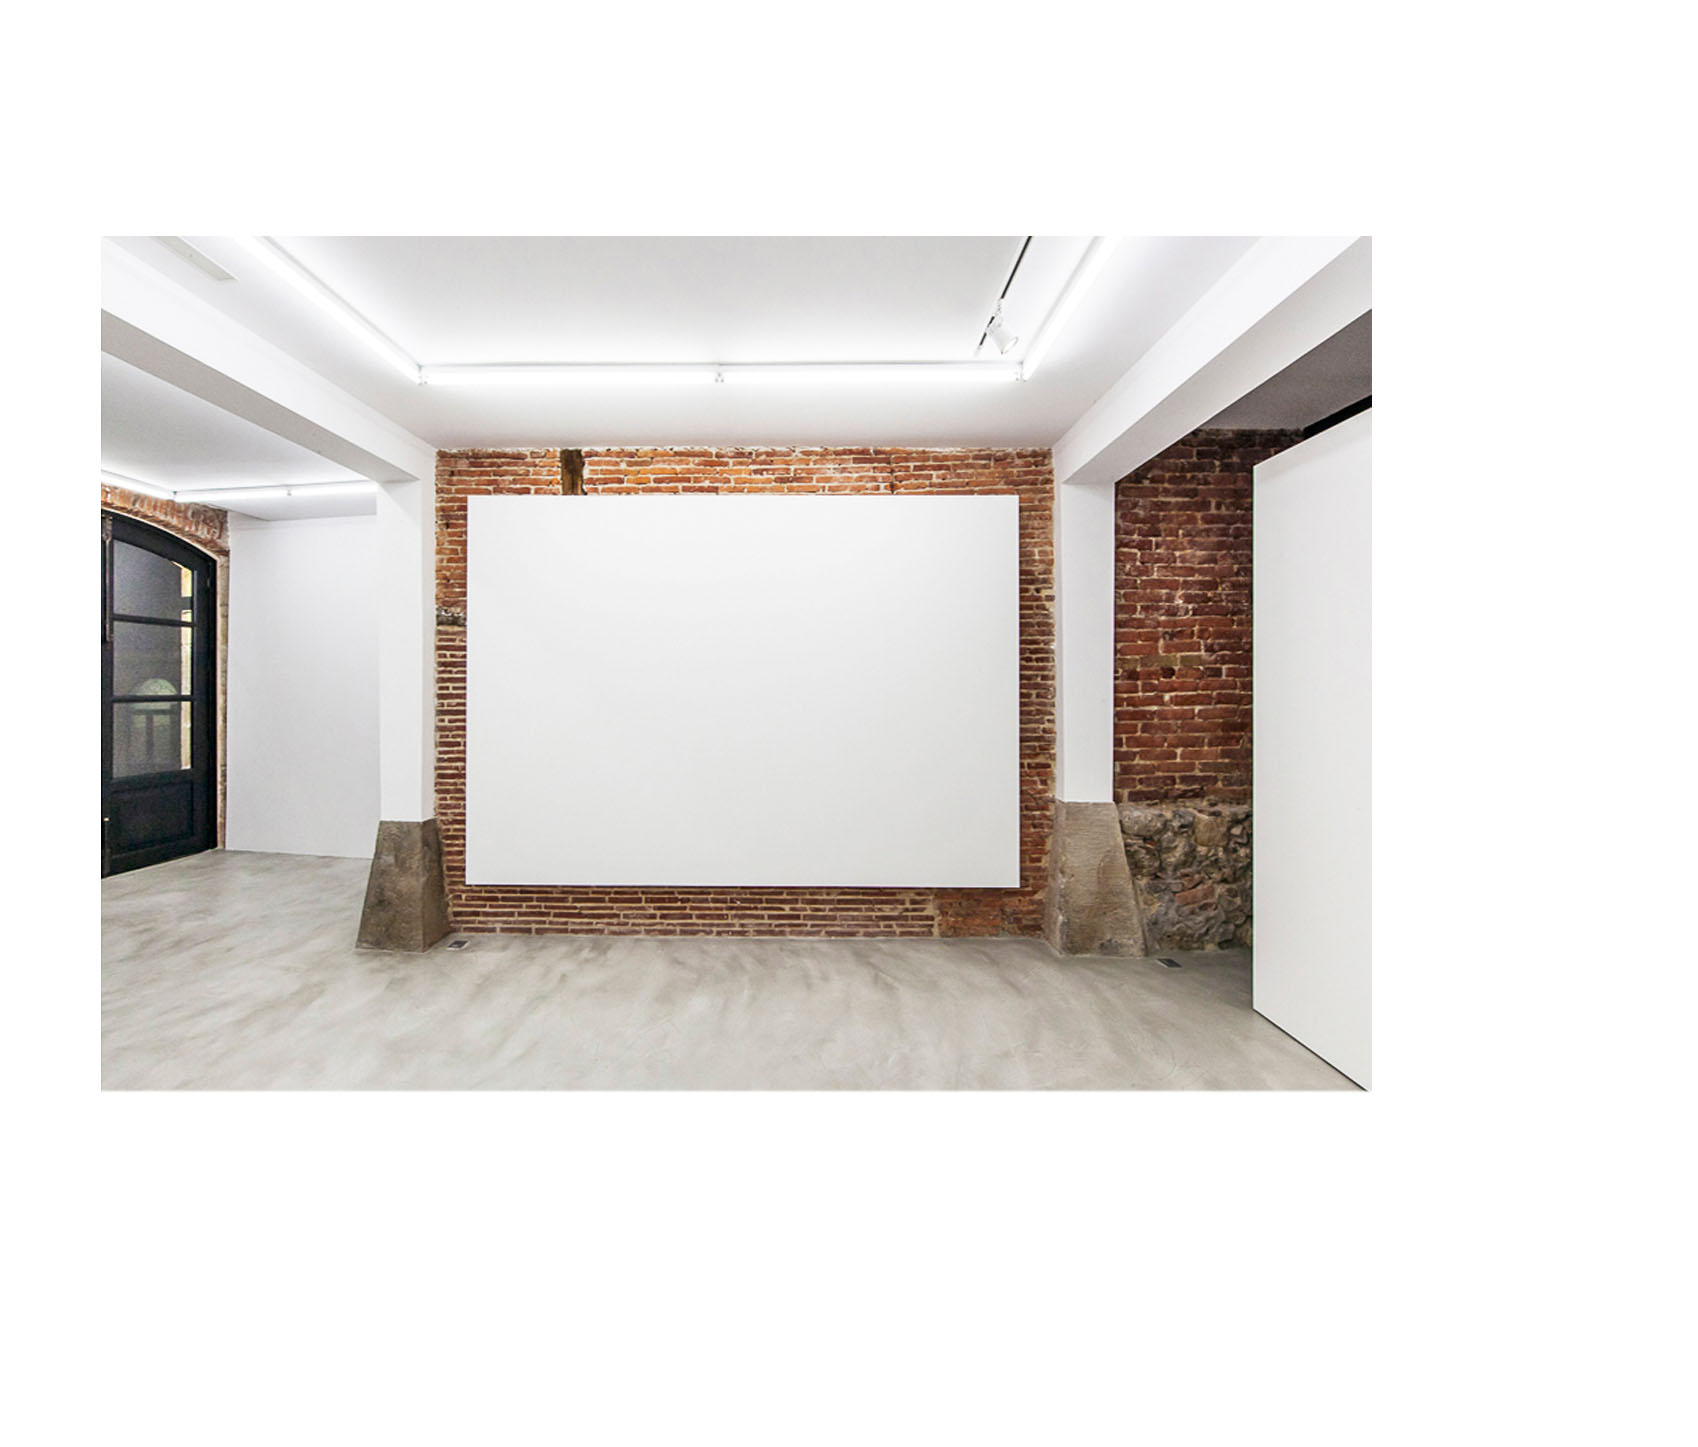 Art Gallery Aldama-Fabré-Bilbao-Image 07.jpg